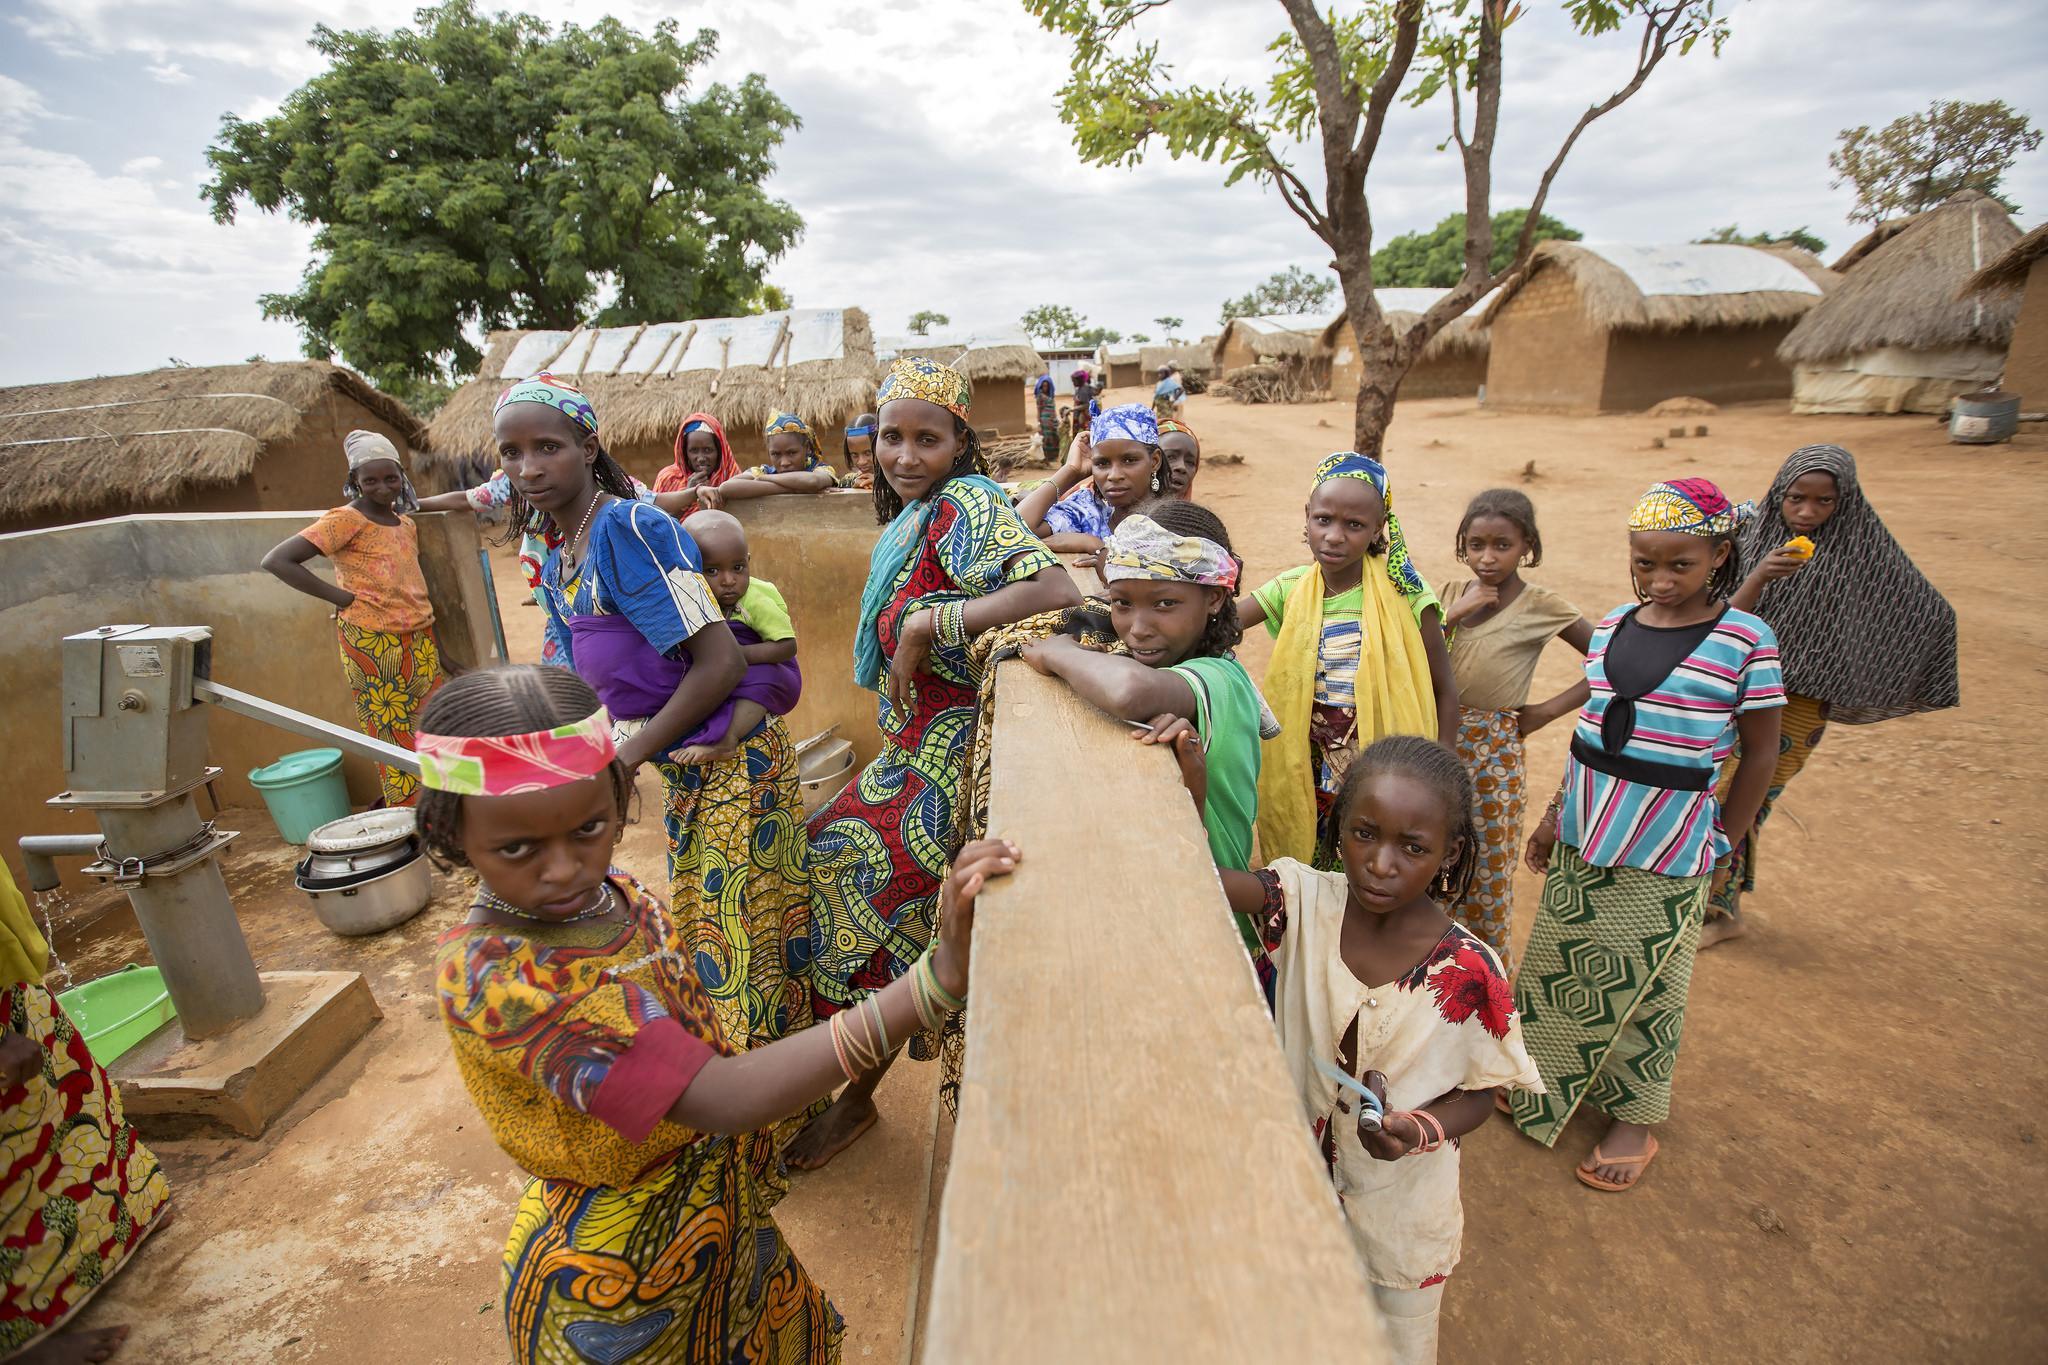 Kamerun - vesipumppu